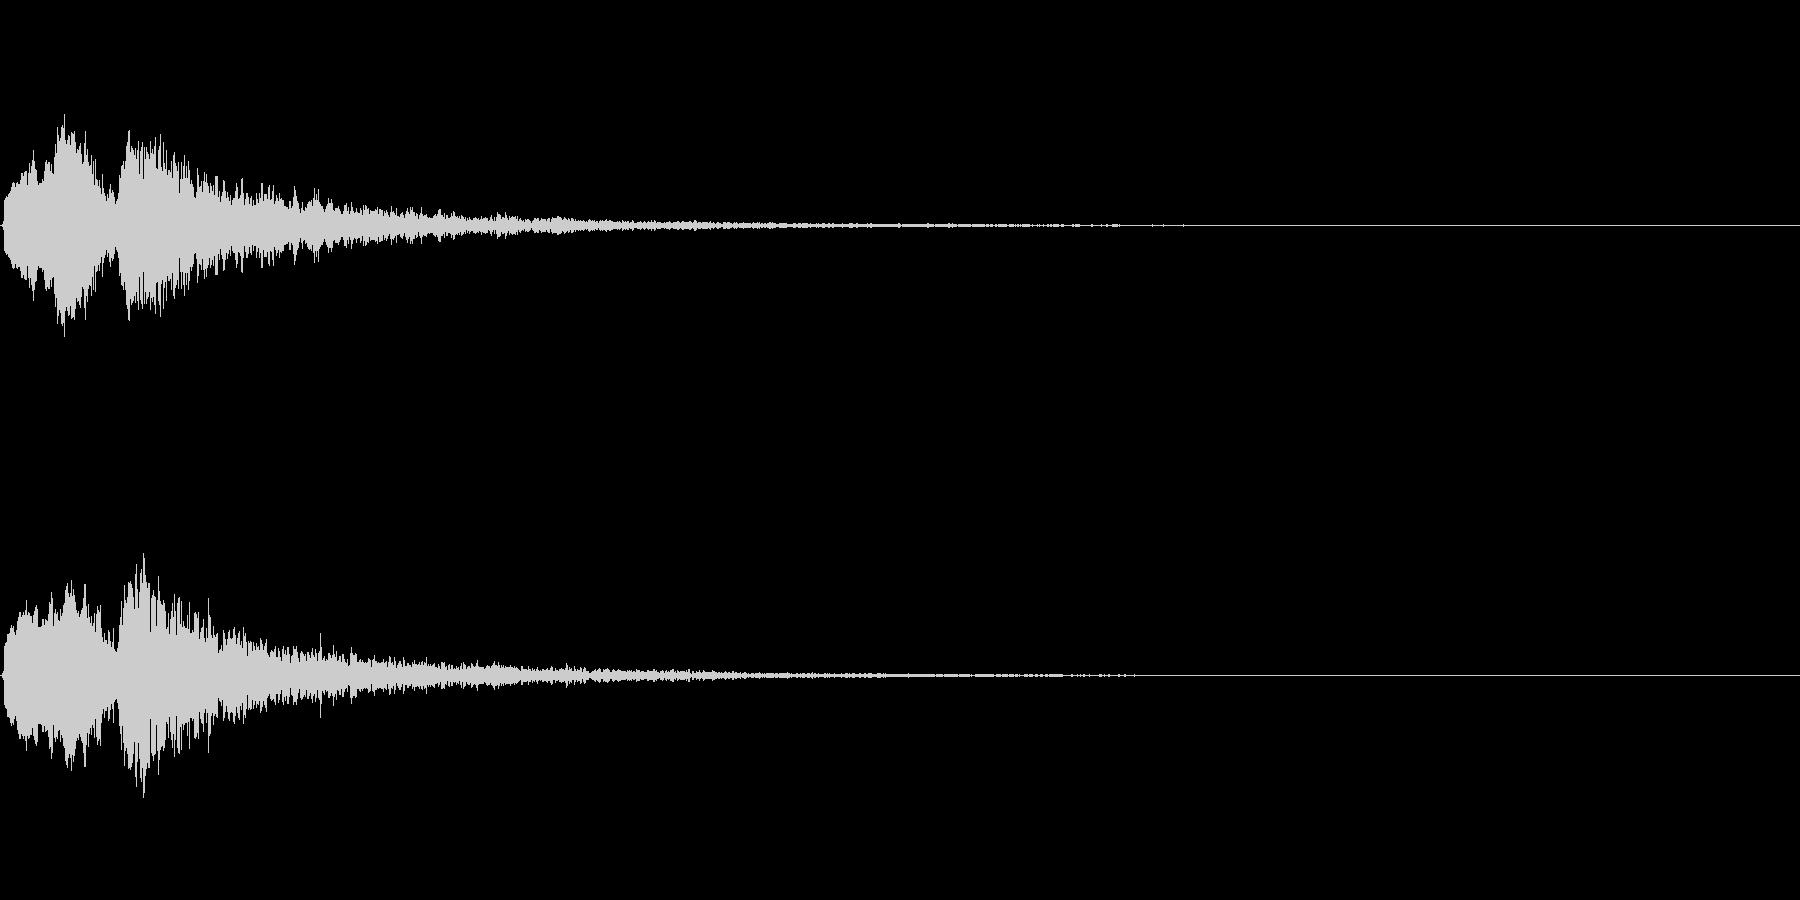 Vox 不気味な鳴き声 ホラーSE 1の未再生の波形